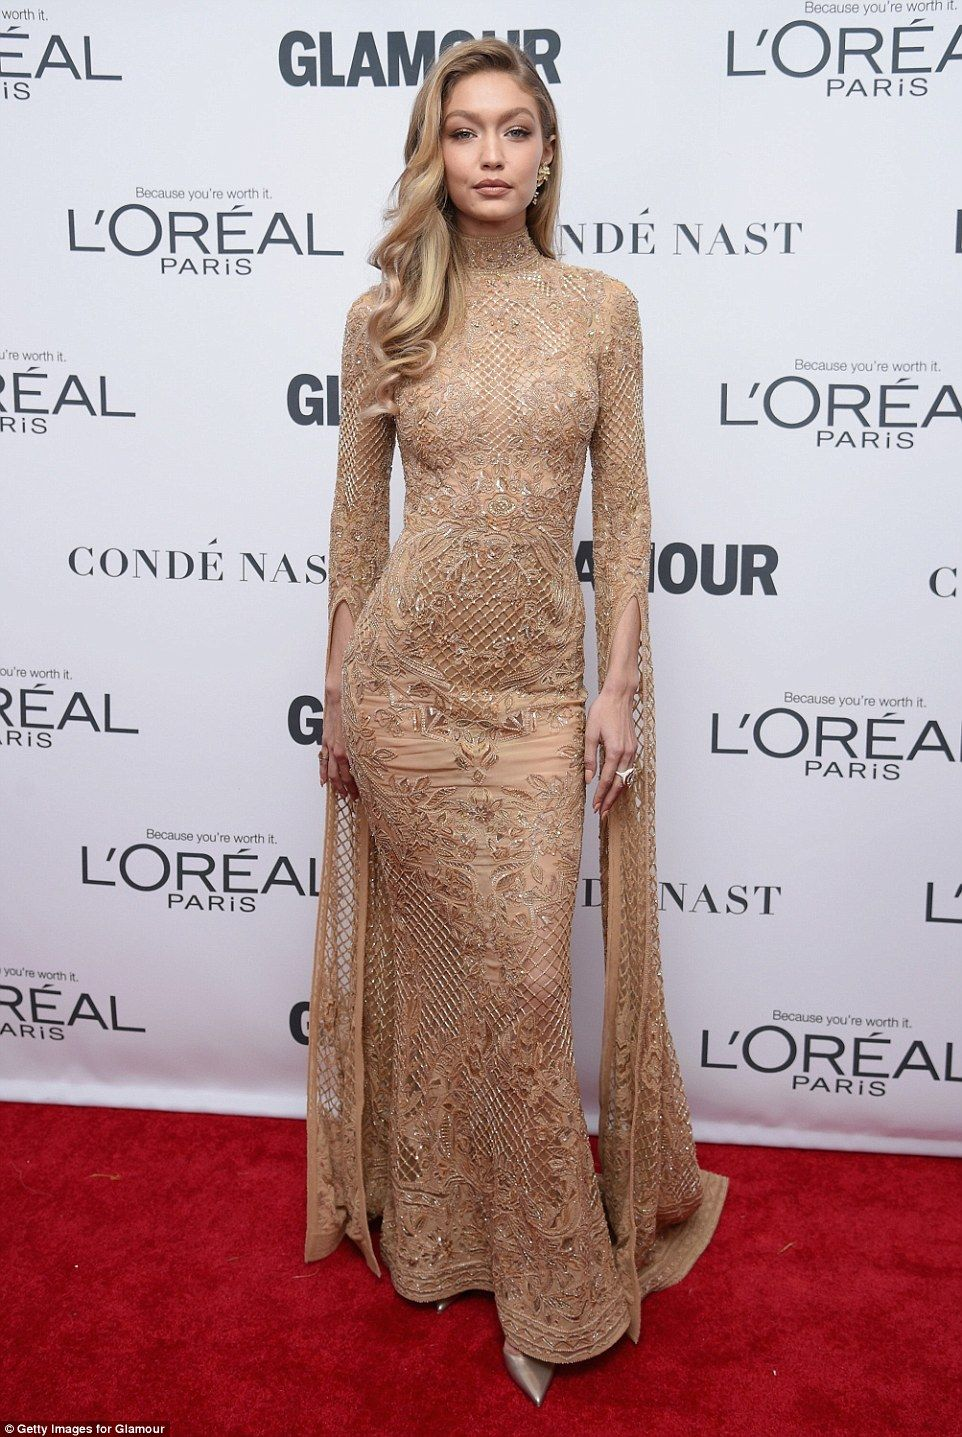 Gigi Hadid Dazzles In Glamorous Gold Gown As Sister Bella Fashion Gigi Hadid Style Nice Dresses [ 1437 x 962 Pixel ]